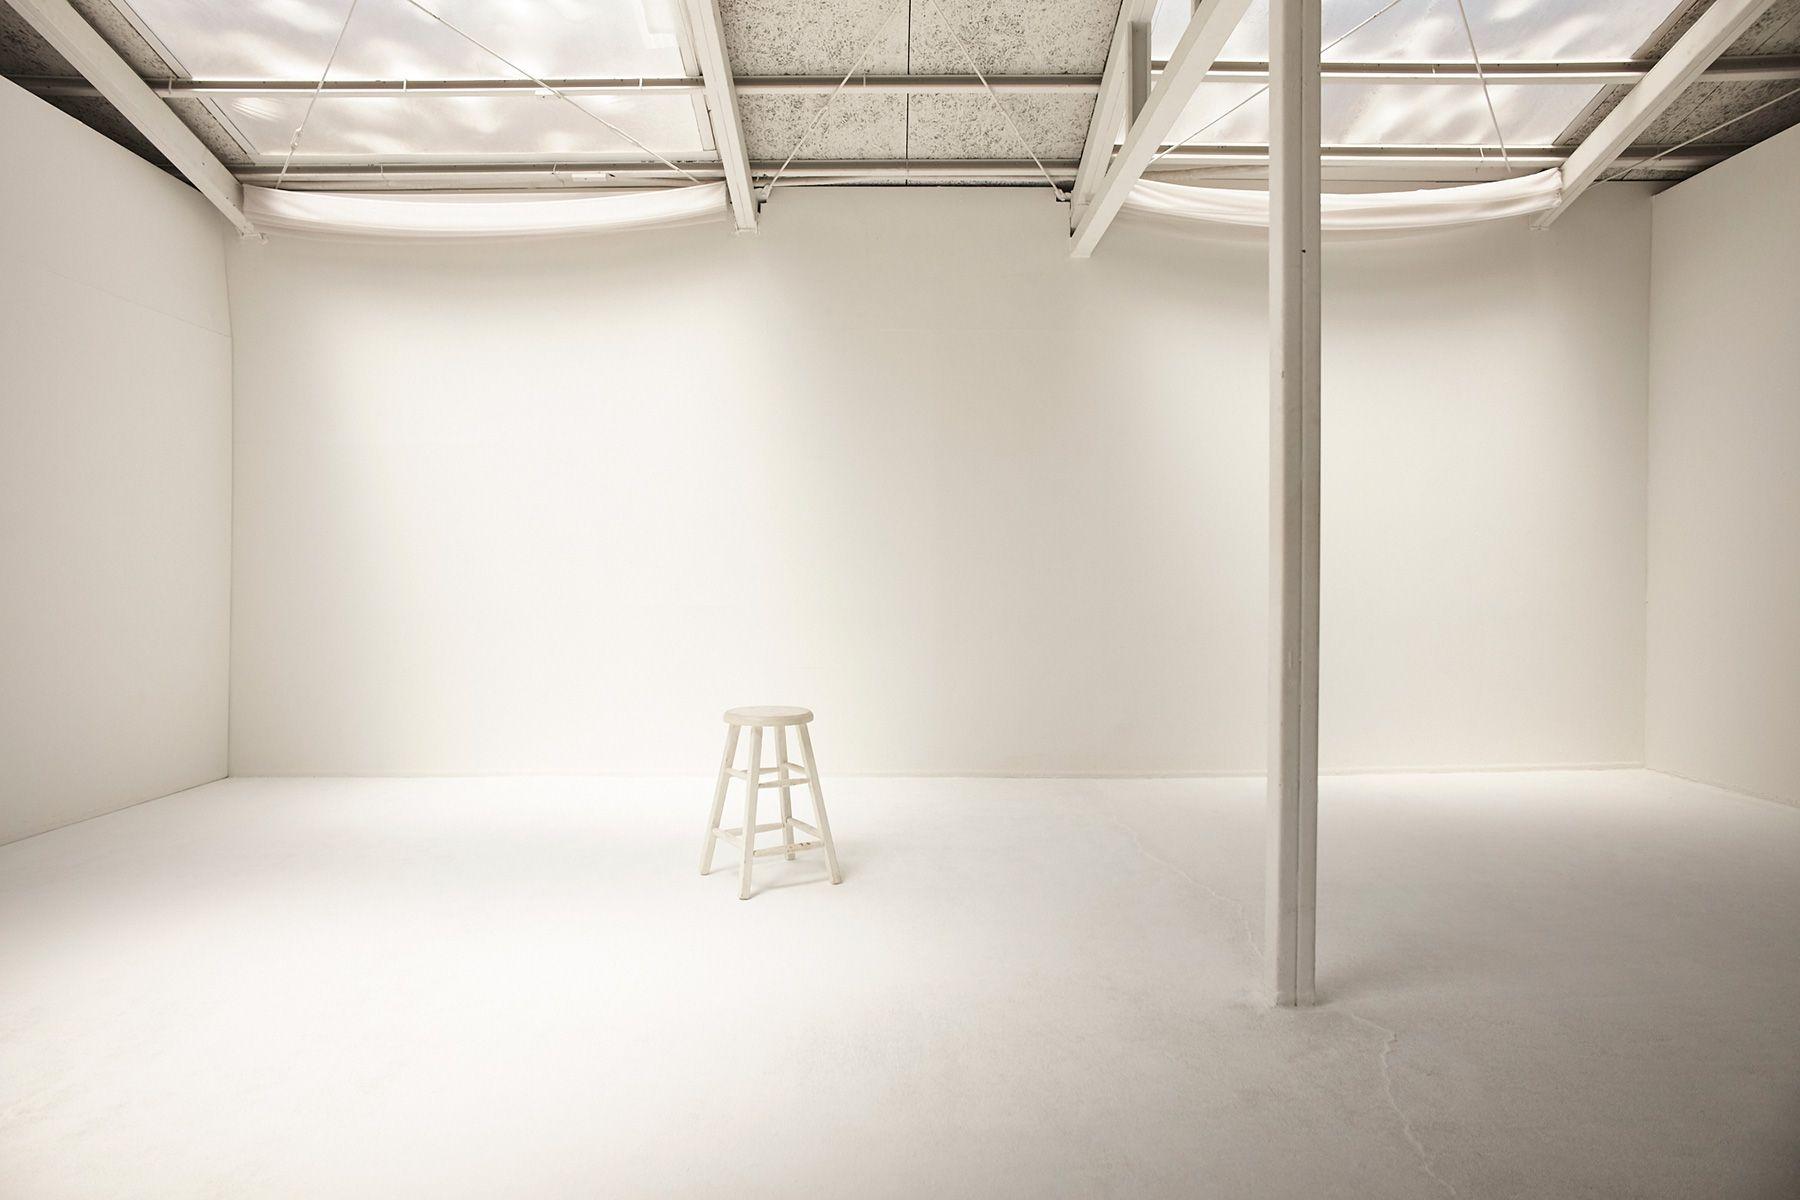 STUDIO MAU(スタジオ マウ)柔らかな光が入ります